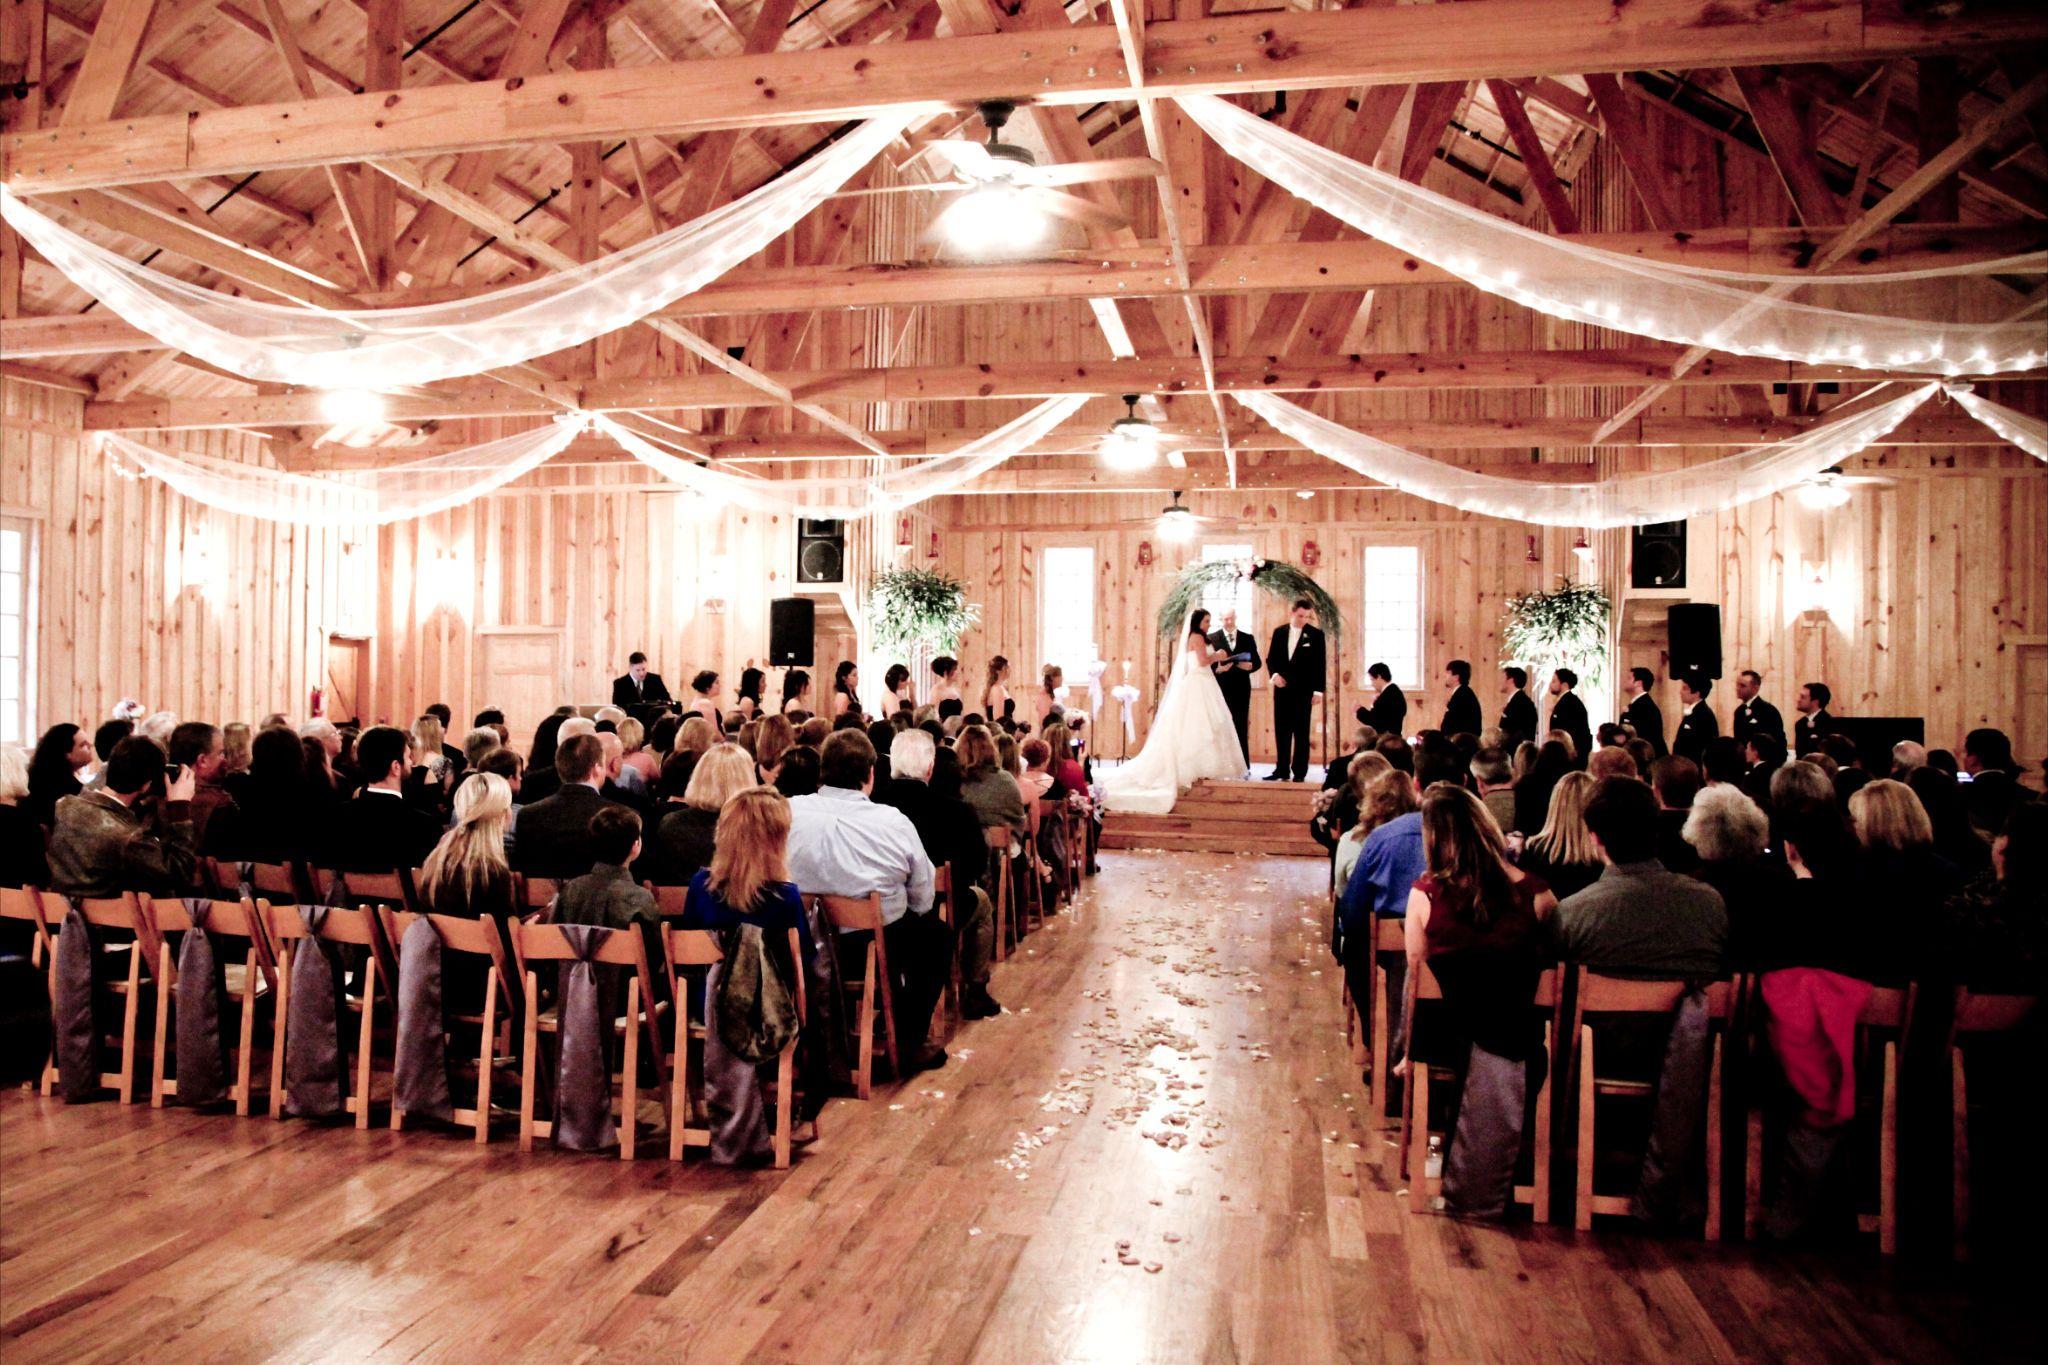 Gabriel Springs #Austin #ATX #Texas #Wedding #AWDS #Love #Bridal #austinweddings #texasweddings